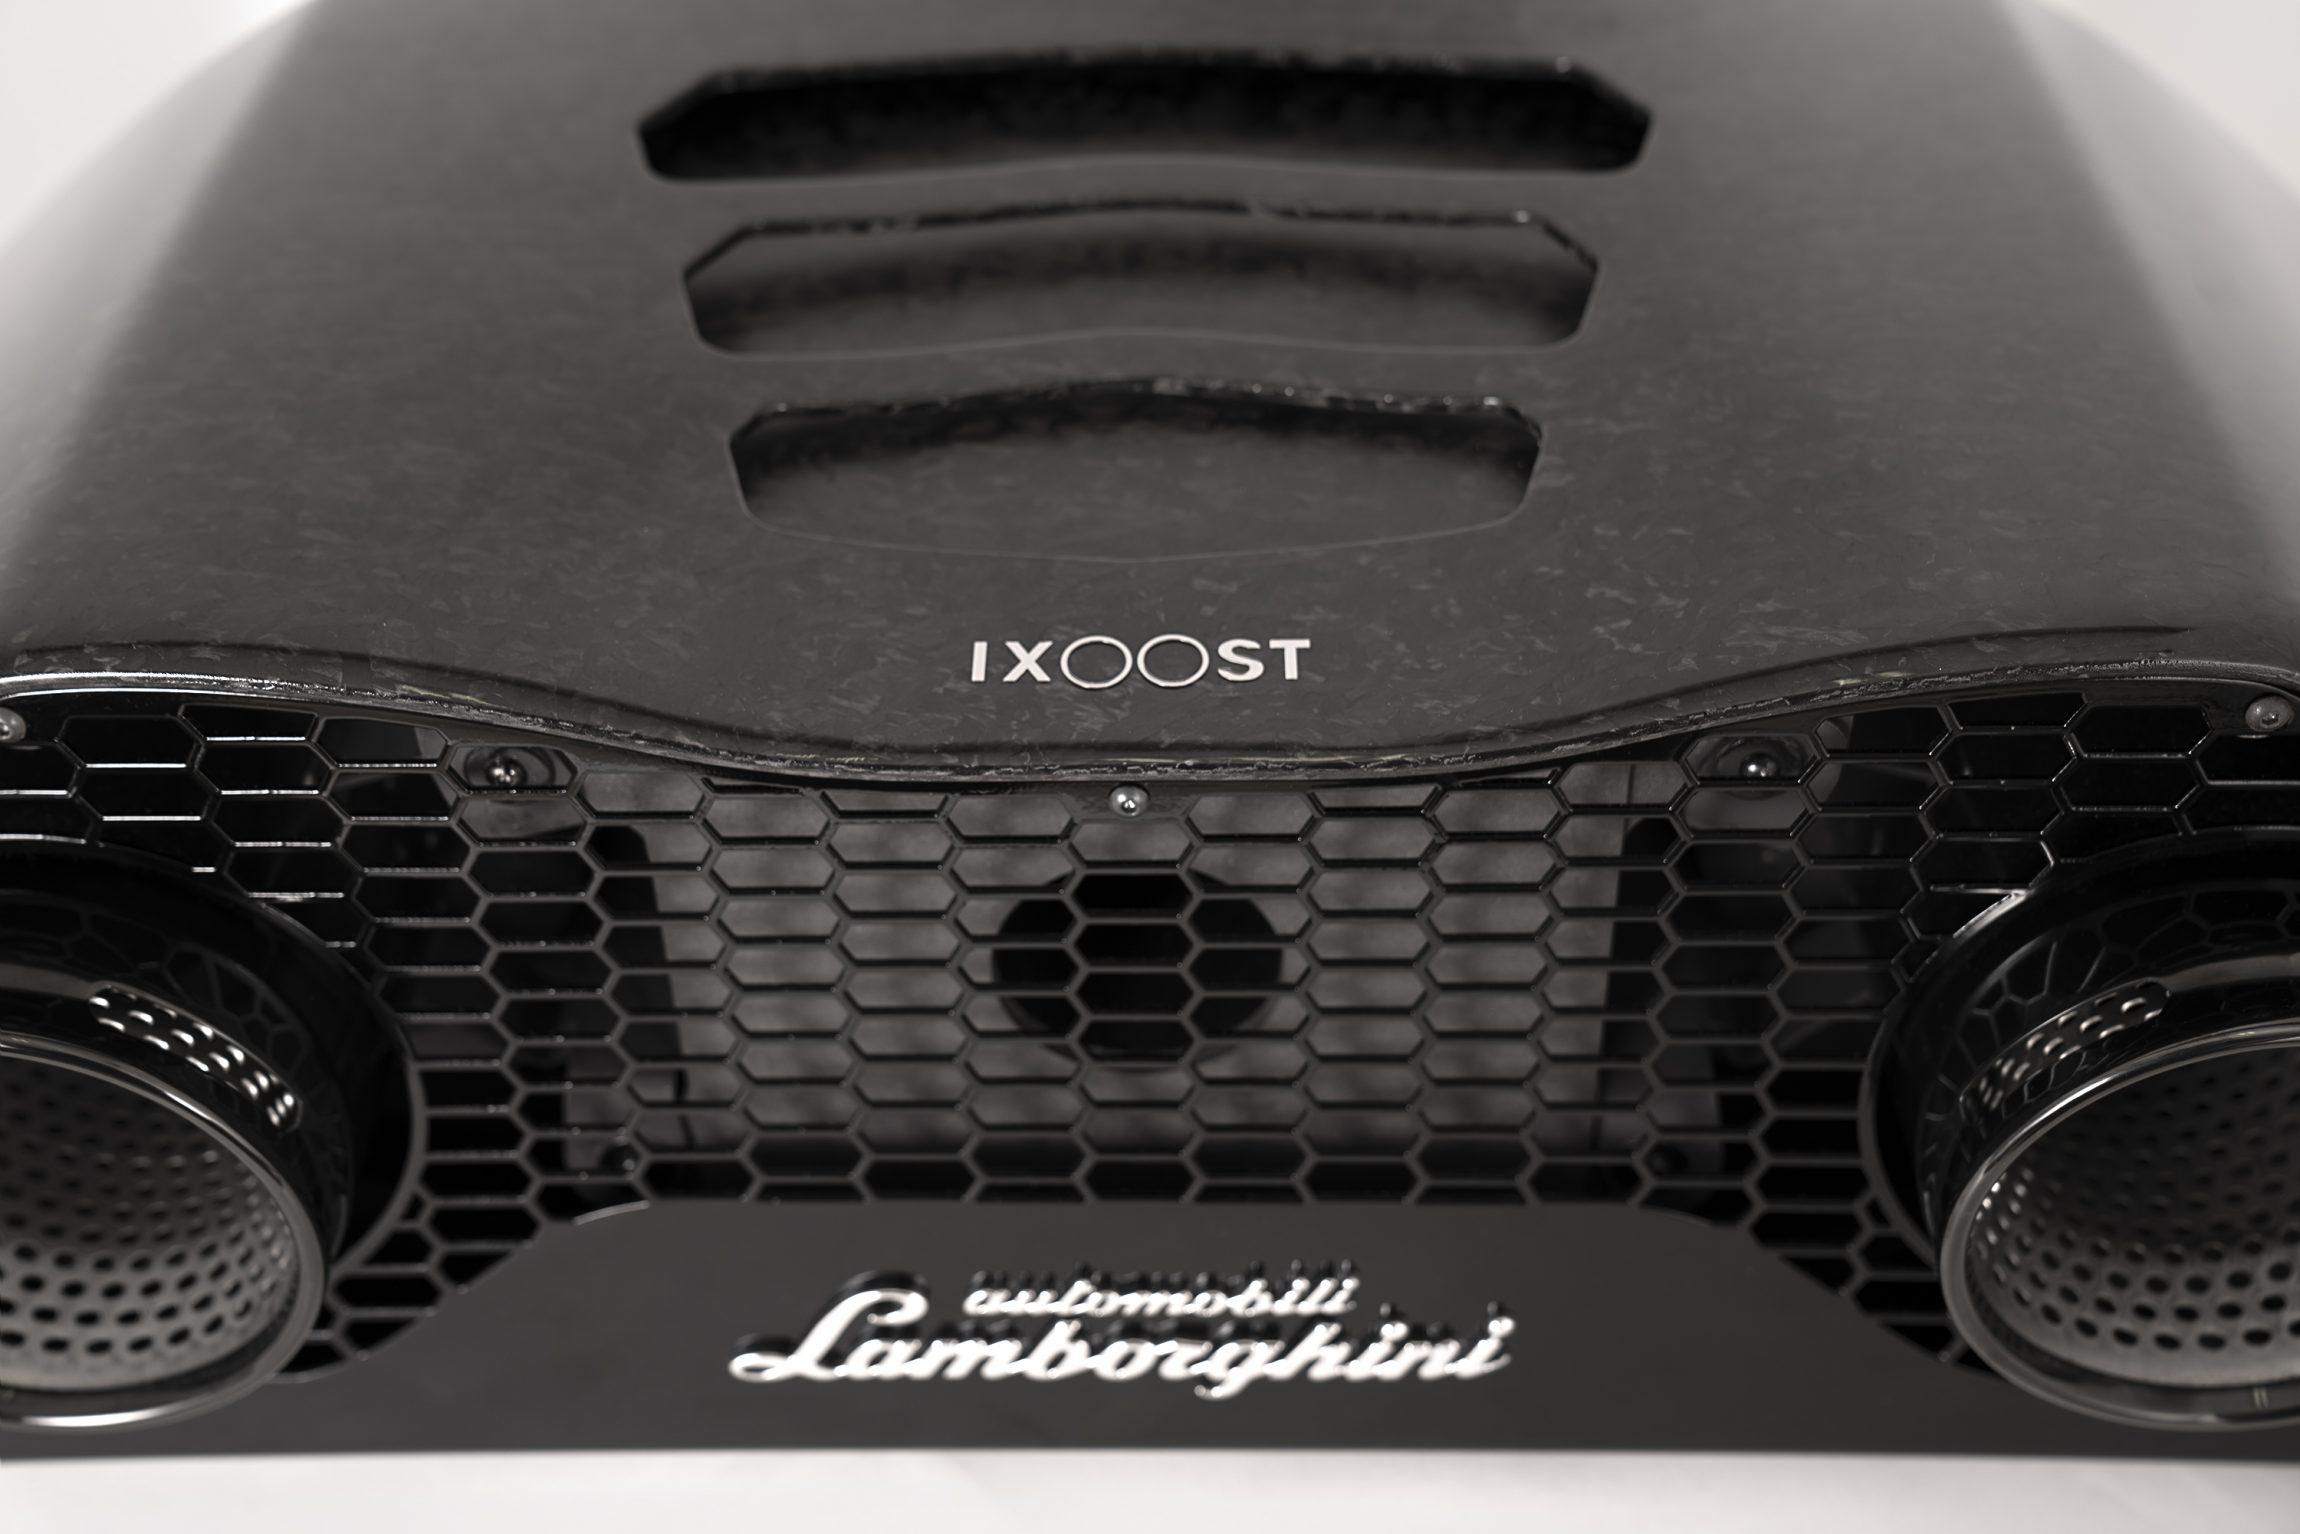 iXOOST AVALÁN Forged Carbon Original Automobili Lamborghini™ Exhaust